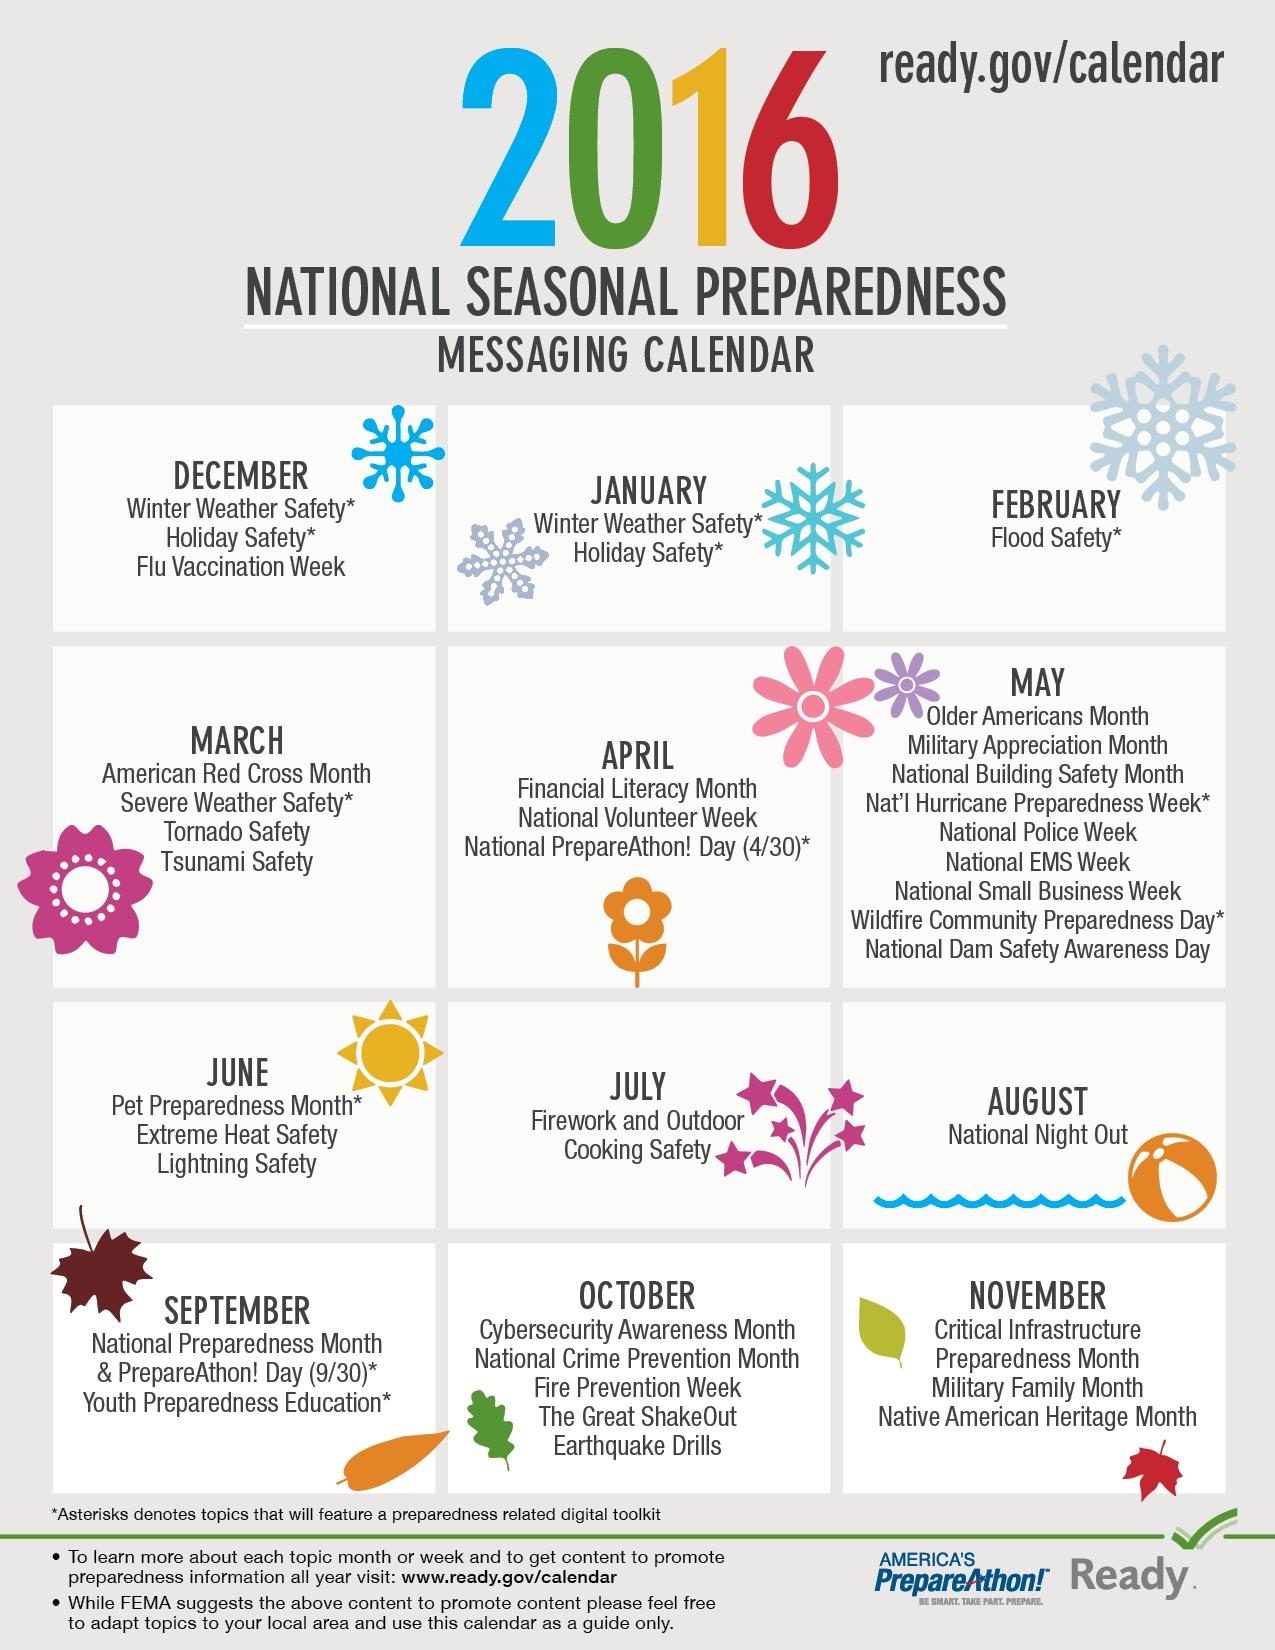 Graphic Ready 2016 National Seasonal Preparedness Messaging